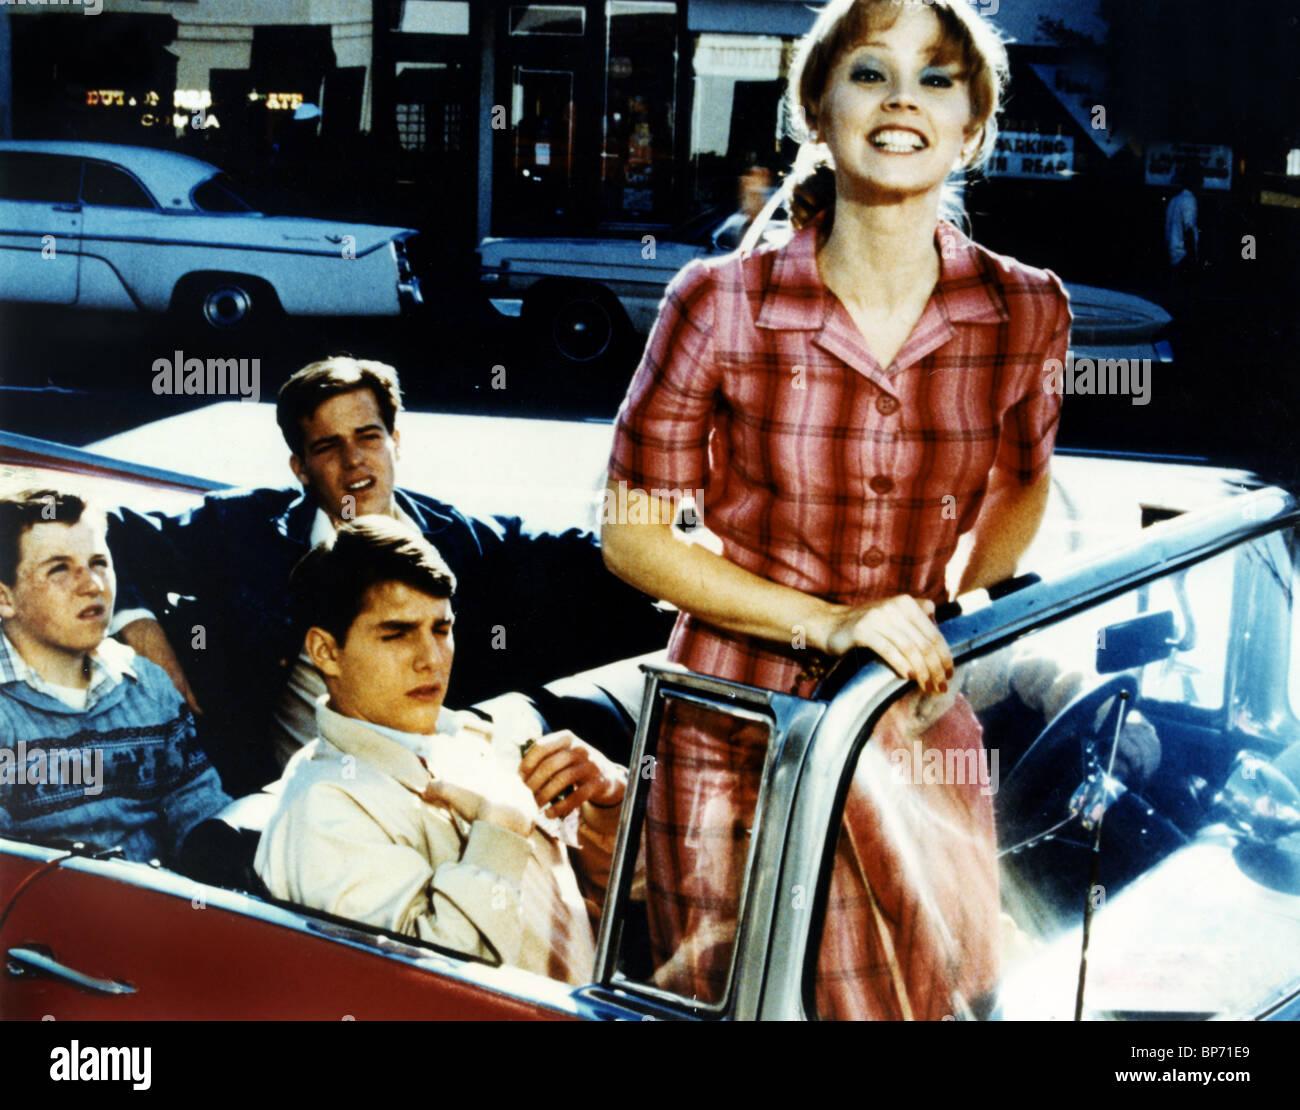 losin it (1983) full movie